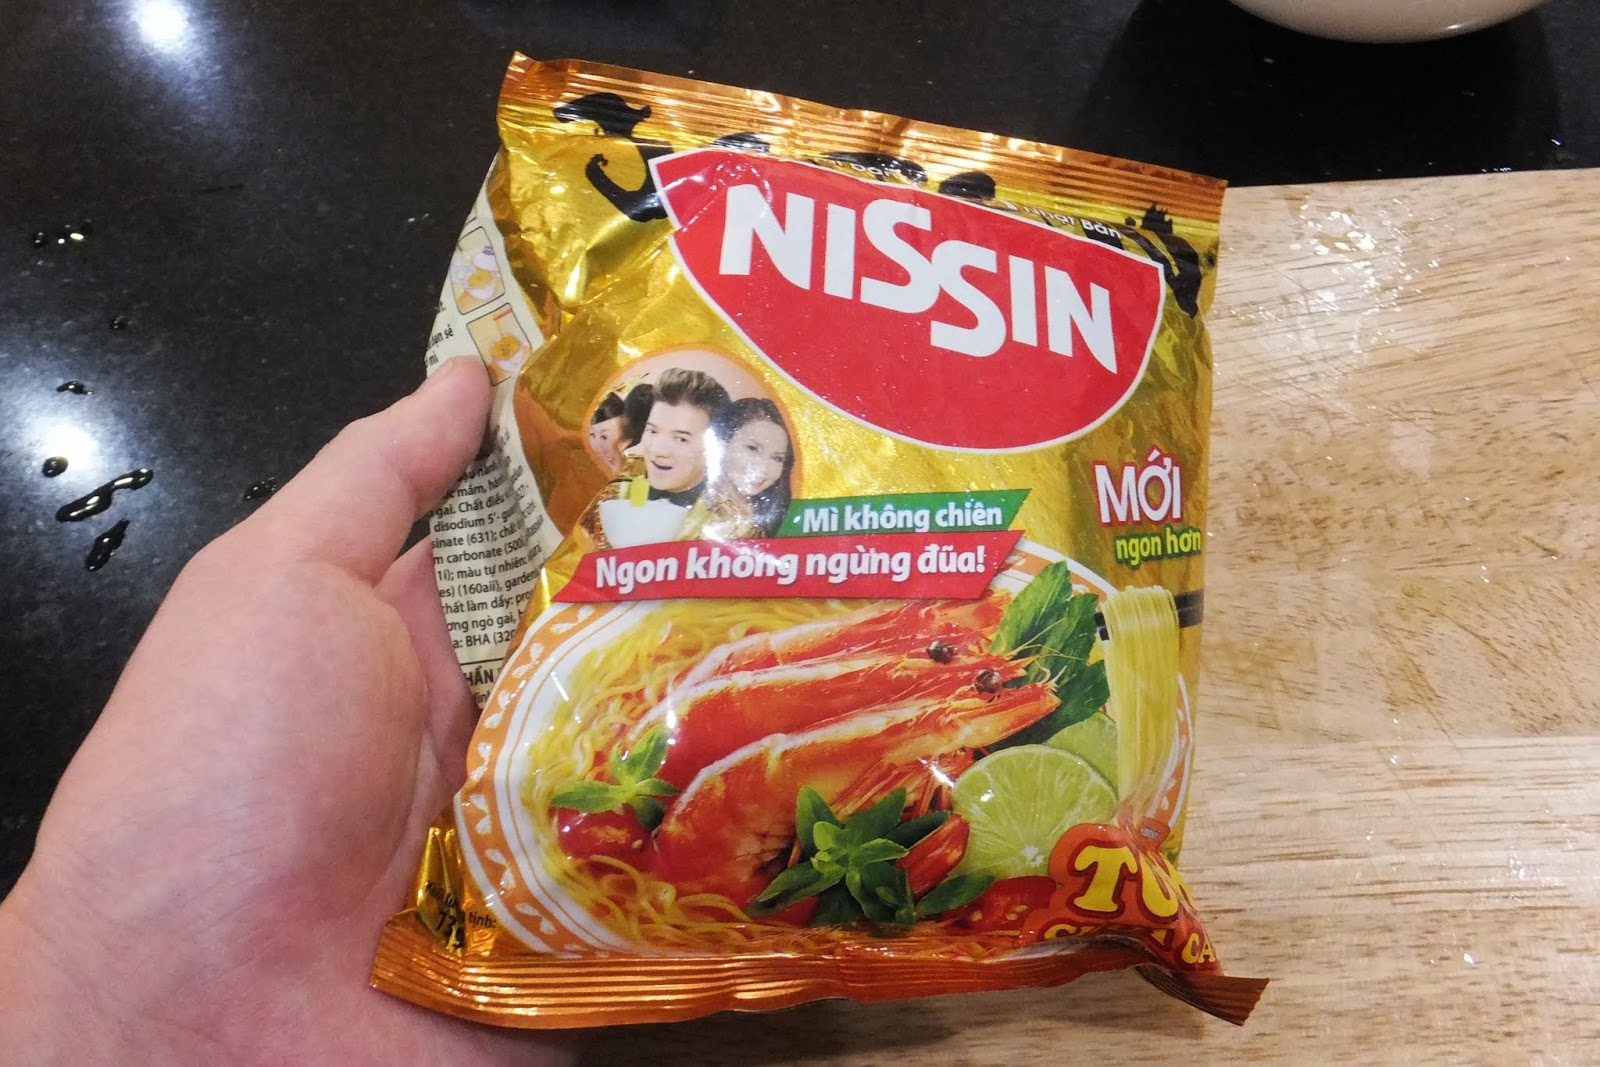 nissin-noodle-vietnam ベトナム日清の即席めん